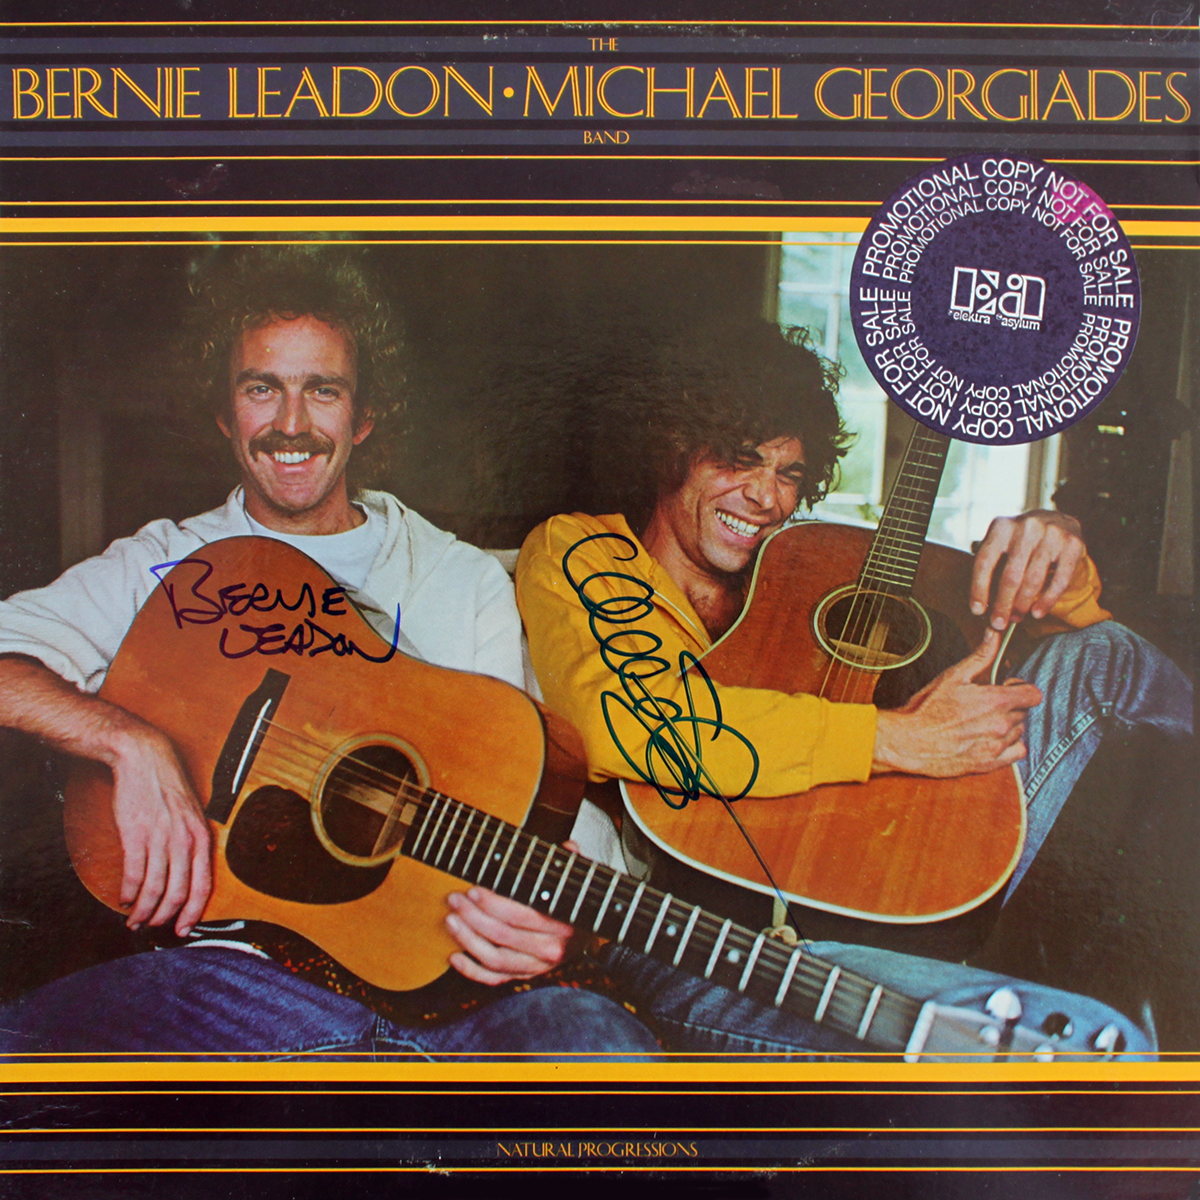 Bernie Leadon & Michael Georgiades Band LP - Natural Progressions